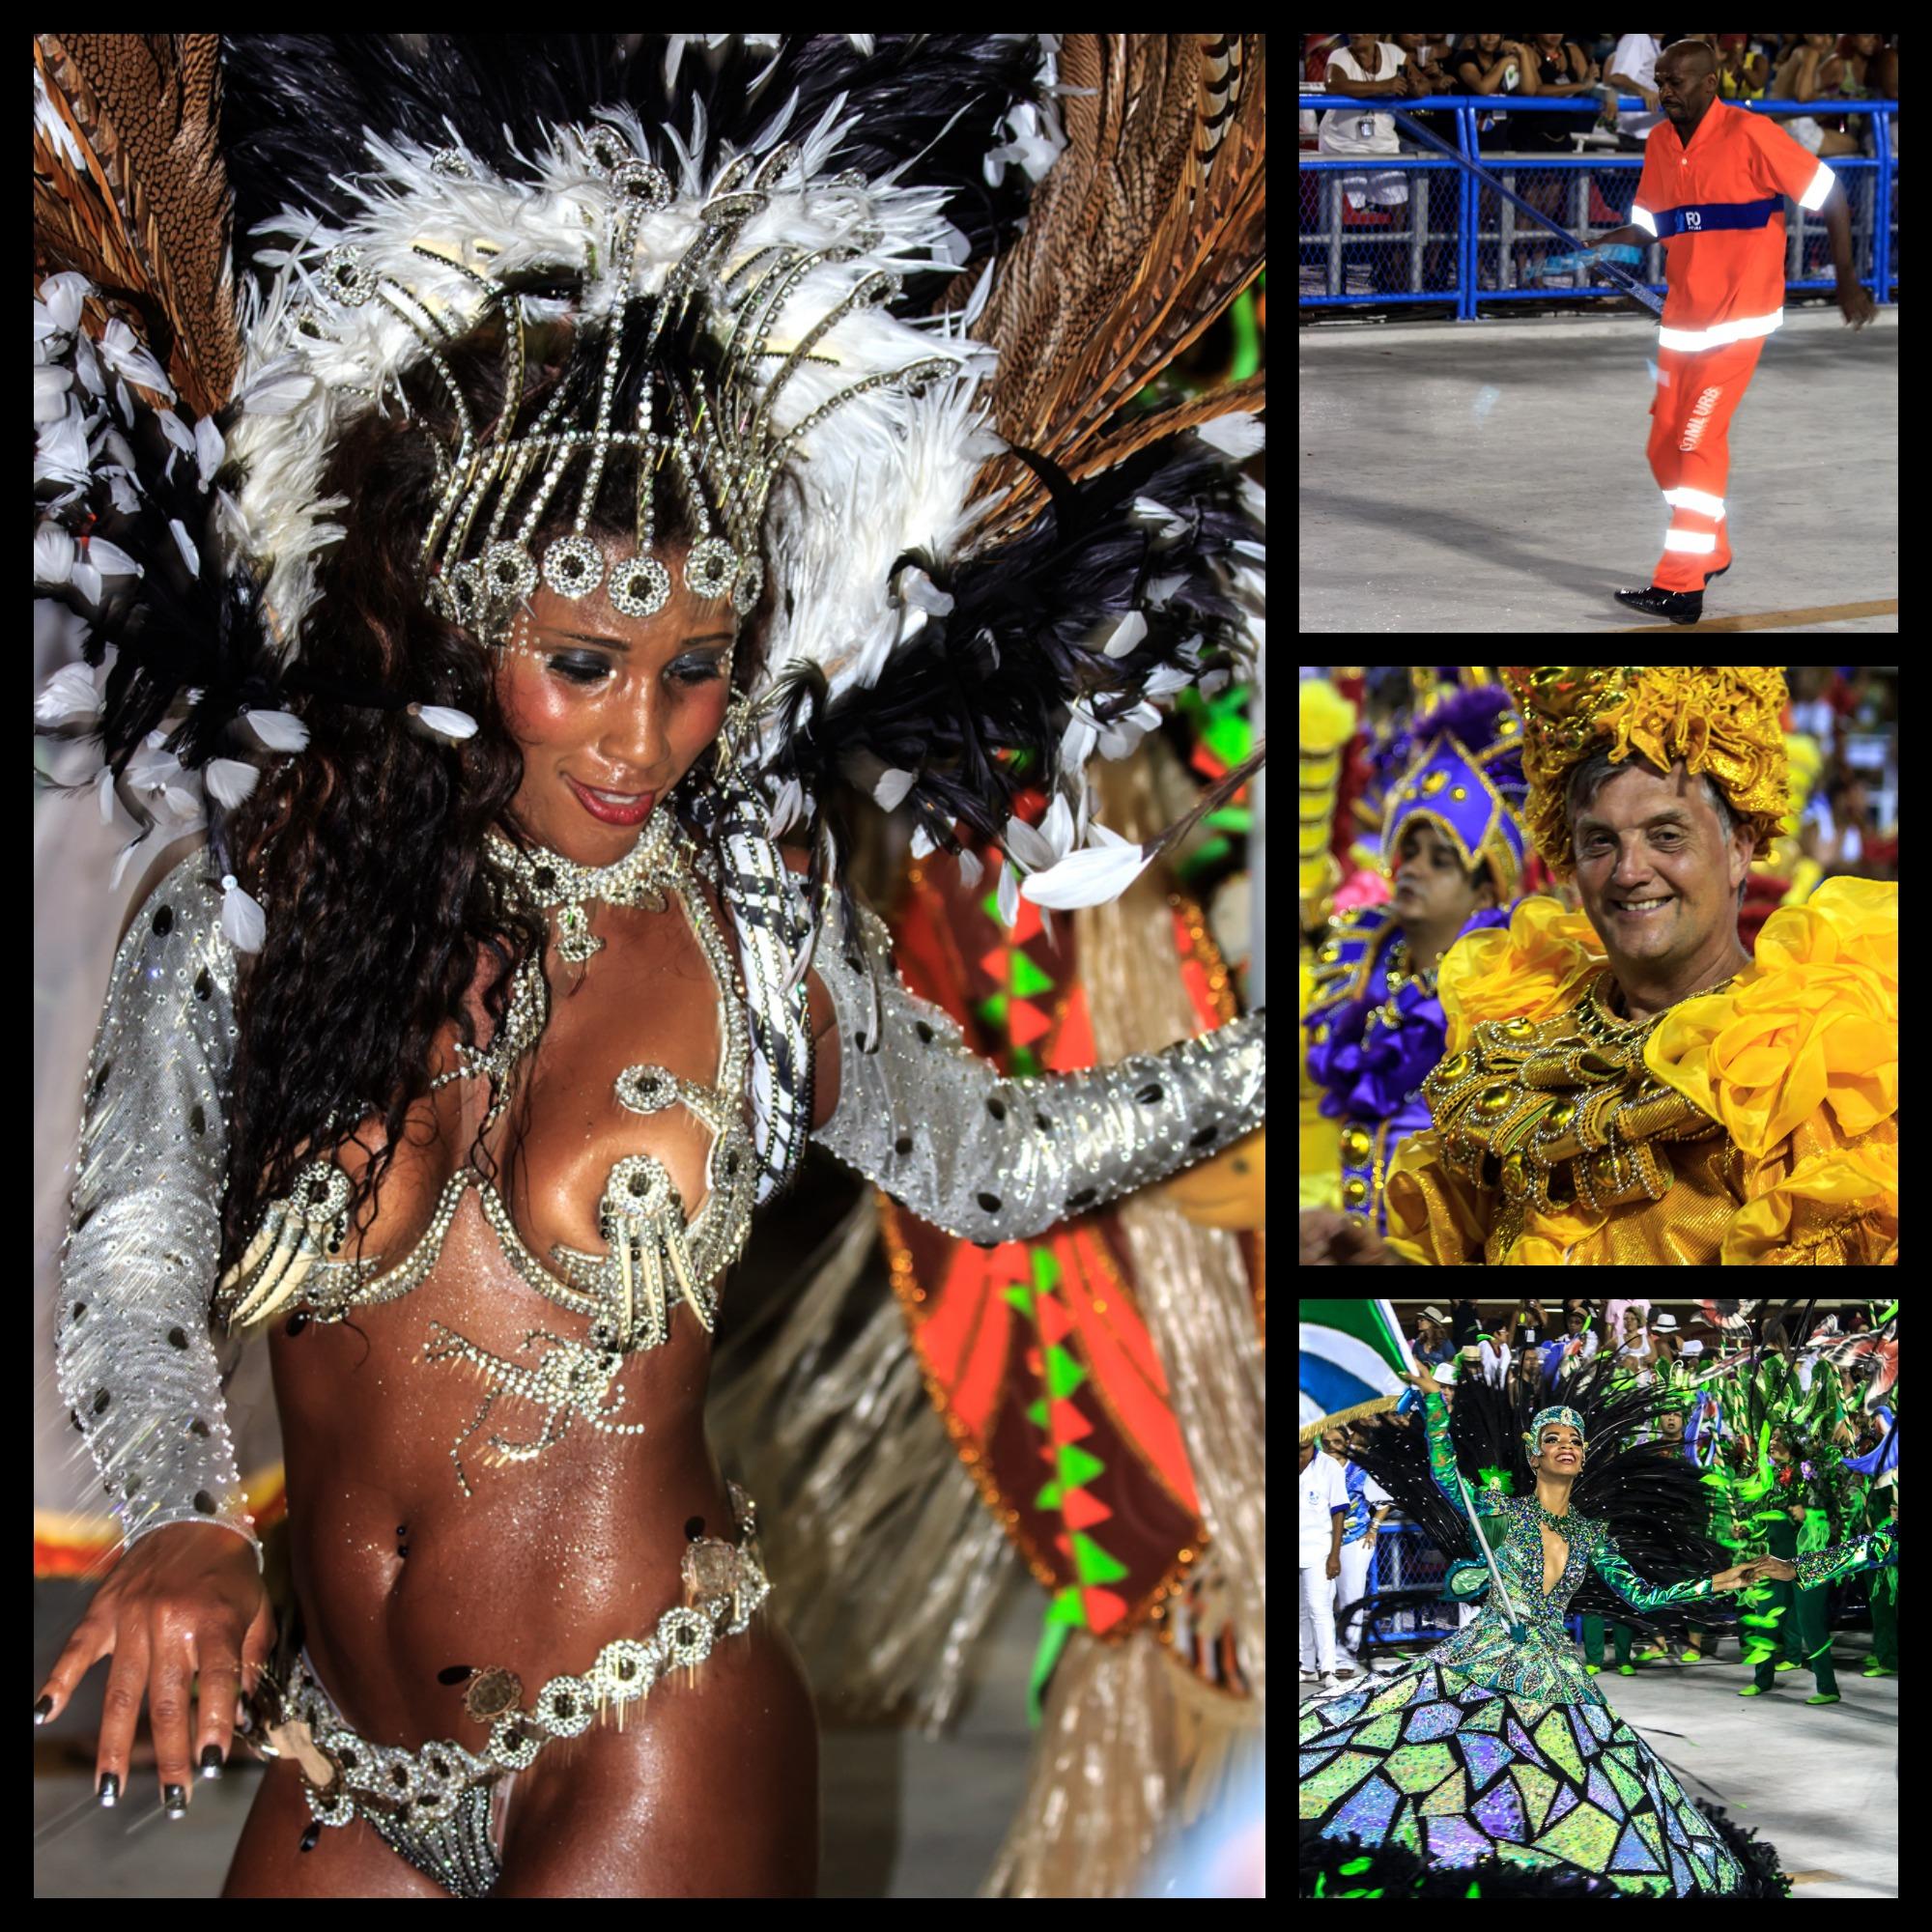 carnaval_006_inma_serrano_esparza